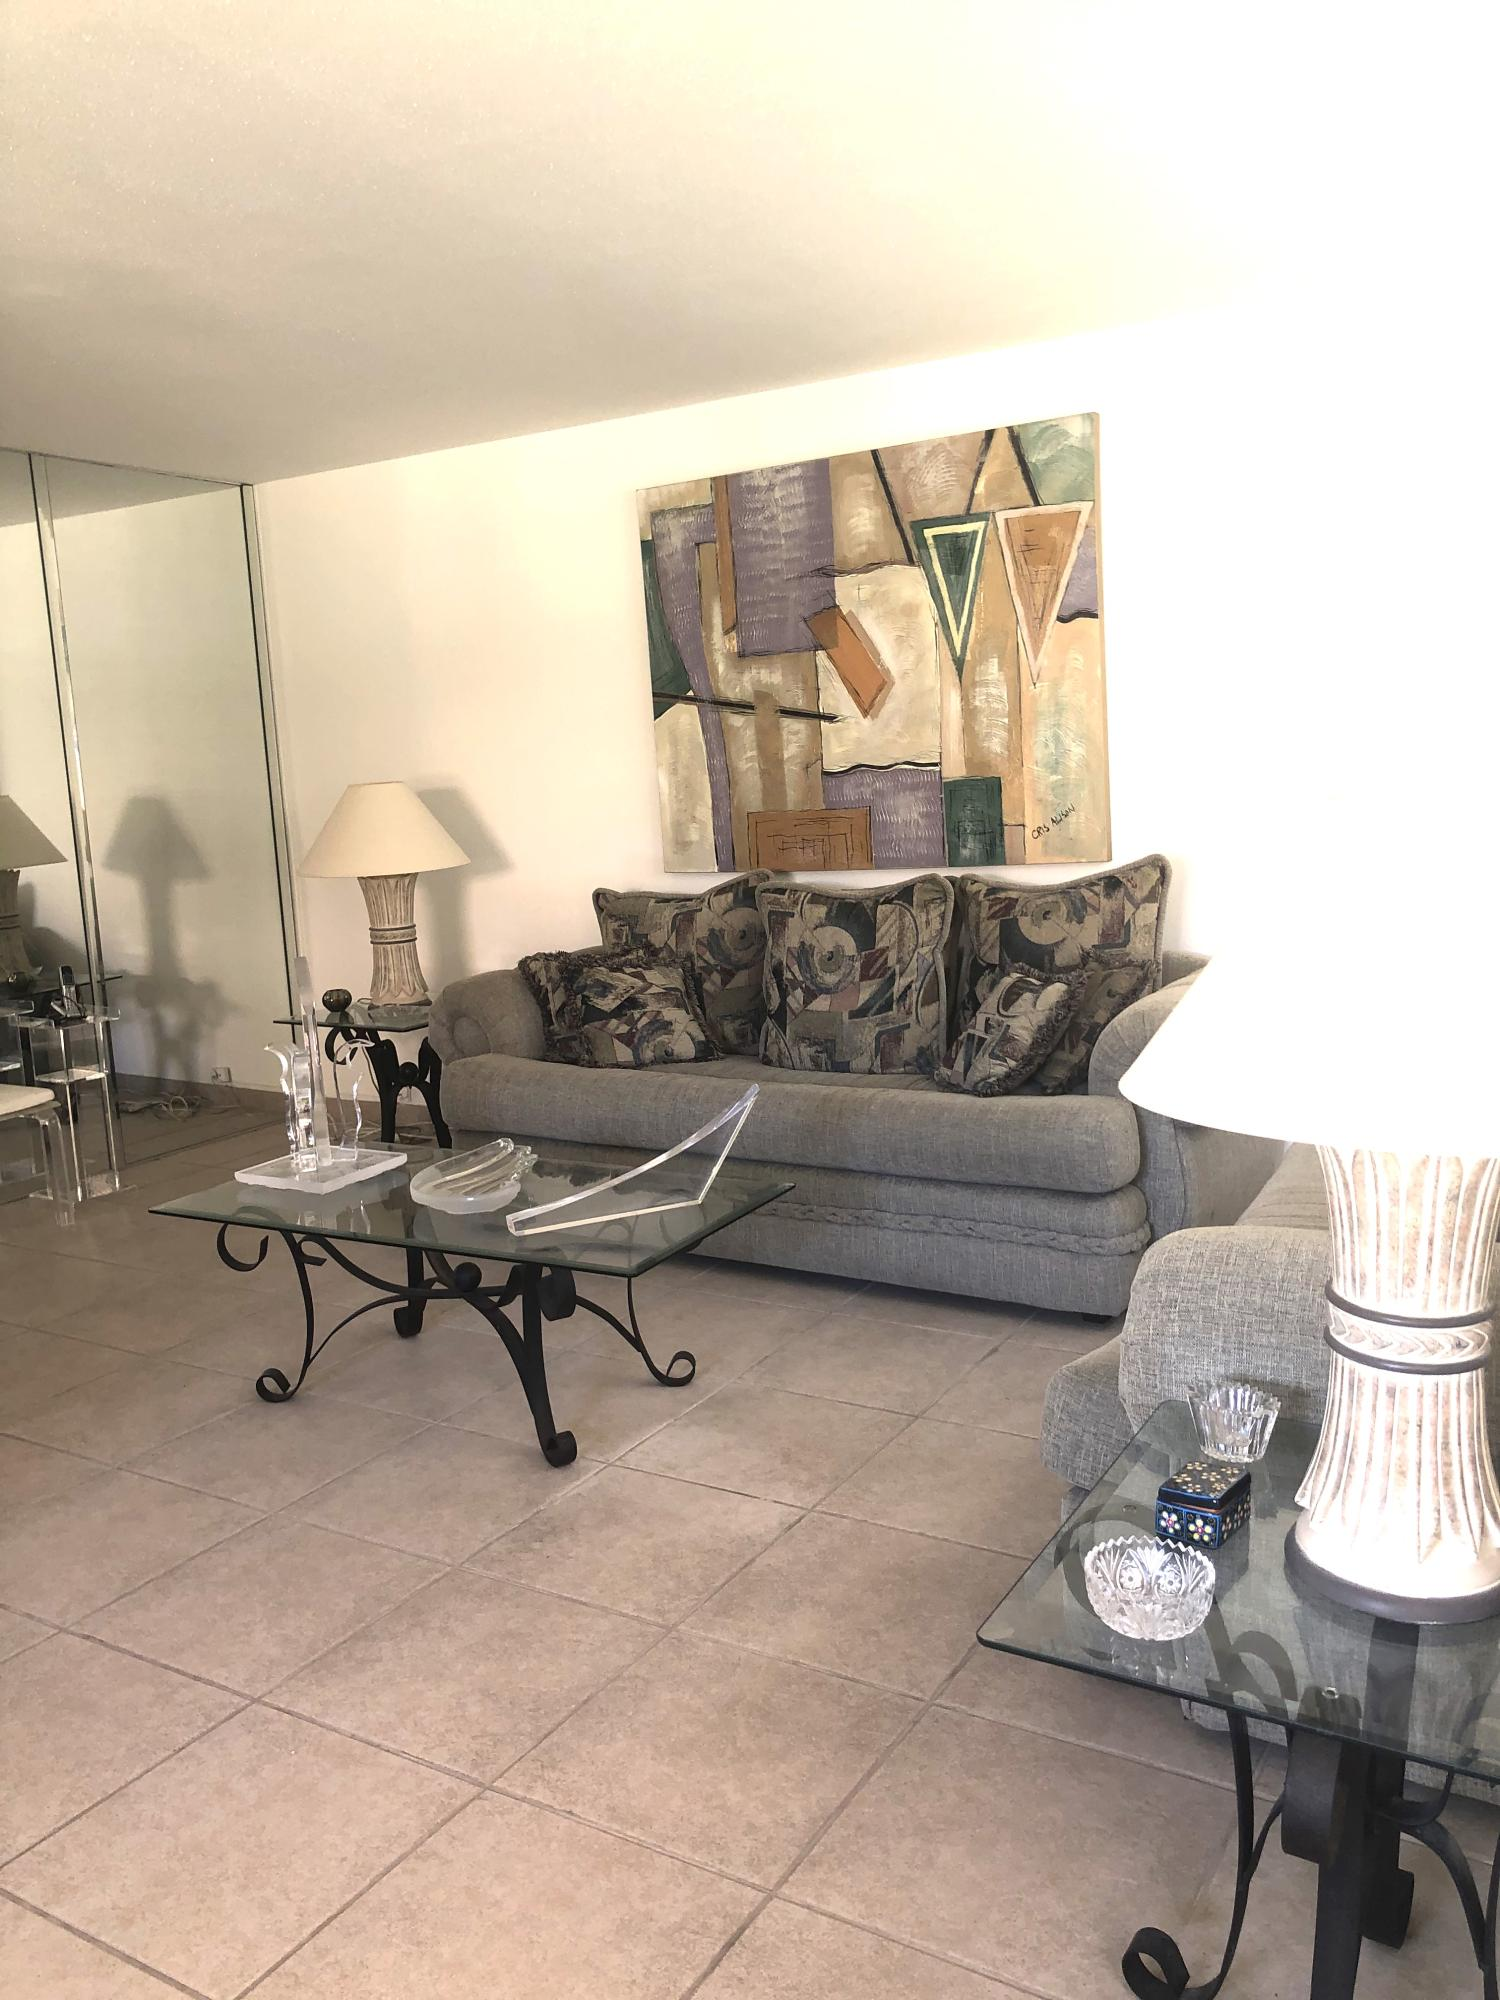 429 Brittany I, Delray Beach, Florida 33446, 2 Bedrooms Bedrooms, ,2 BathroomsBathrooms,A,Condominium,Brittany I,RX-10603538